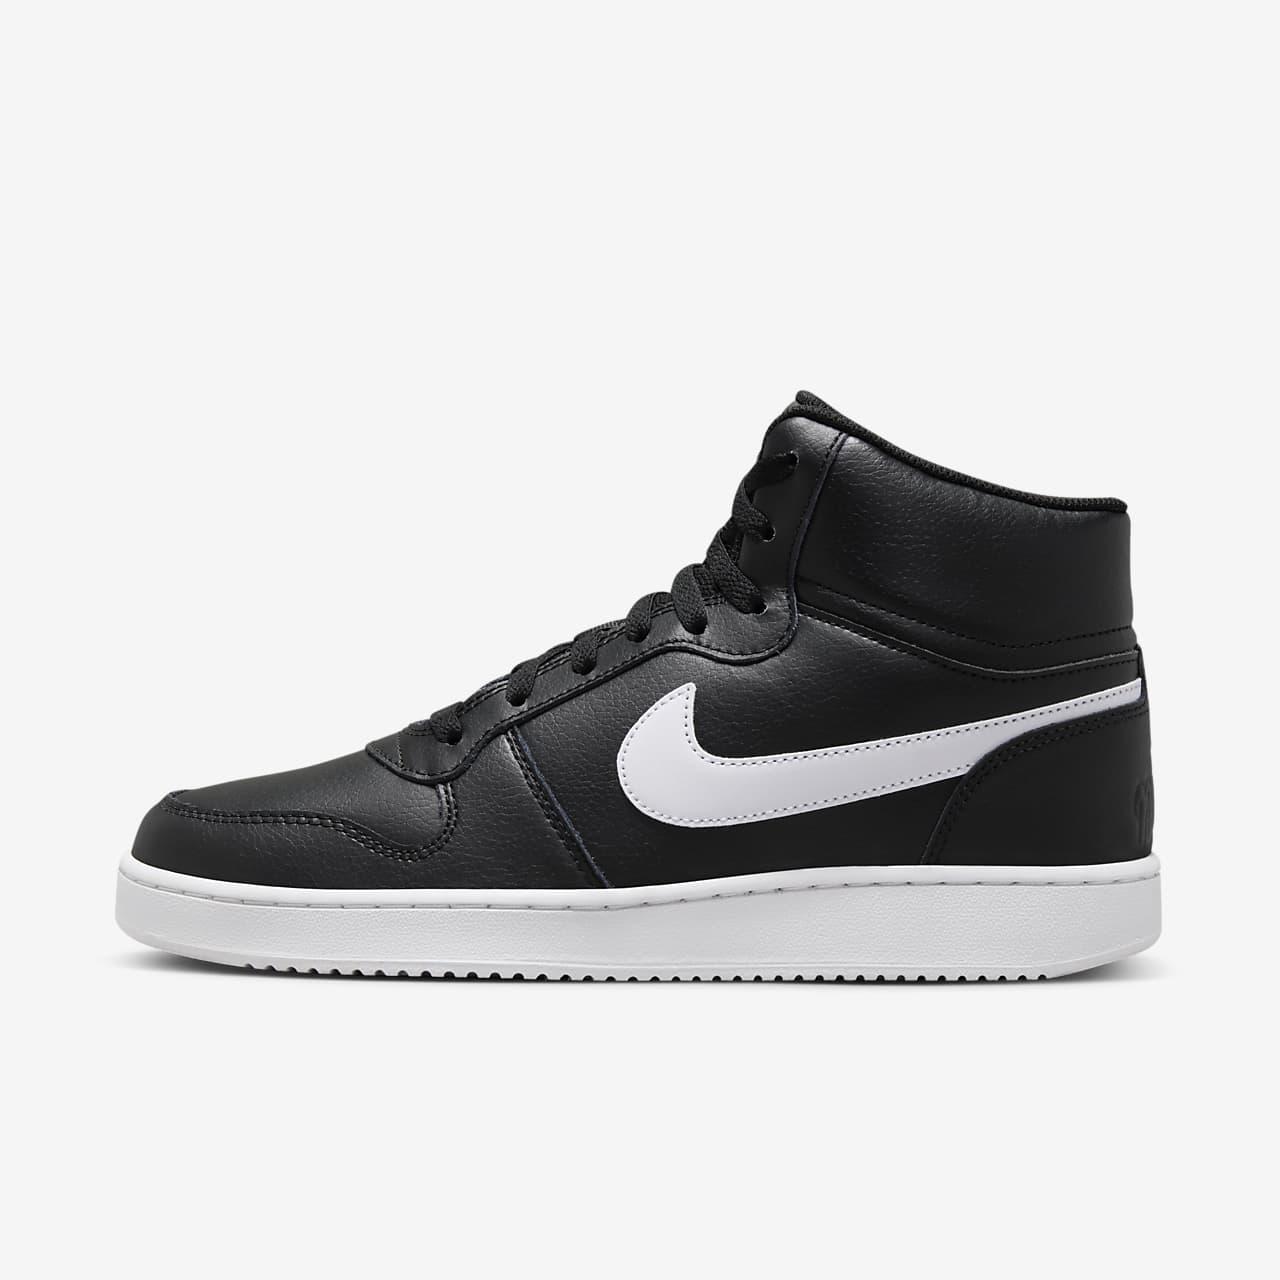 34a4637c9f656 Chaussure Nike Ebernon Mid pour Homme. Nike.com FR